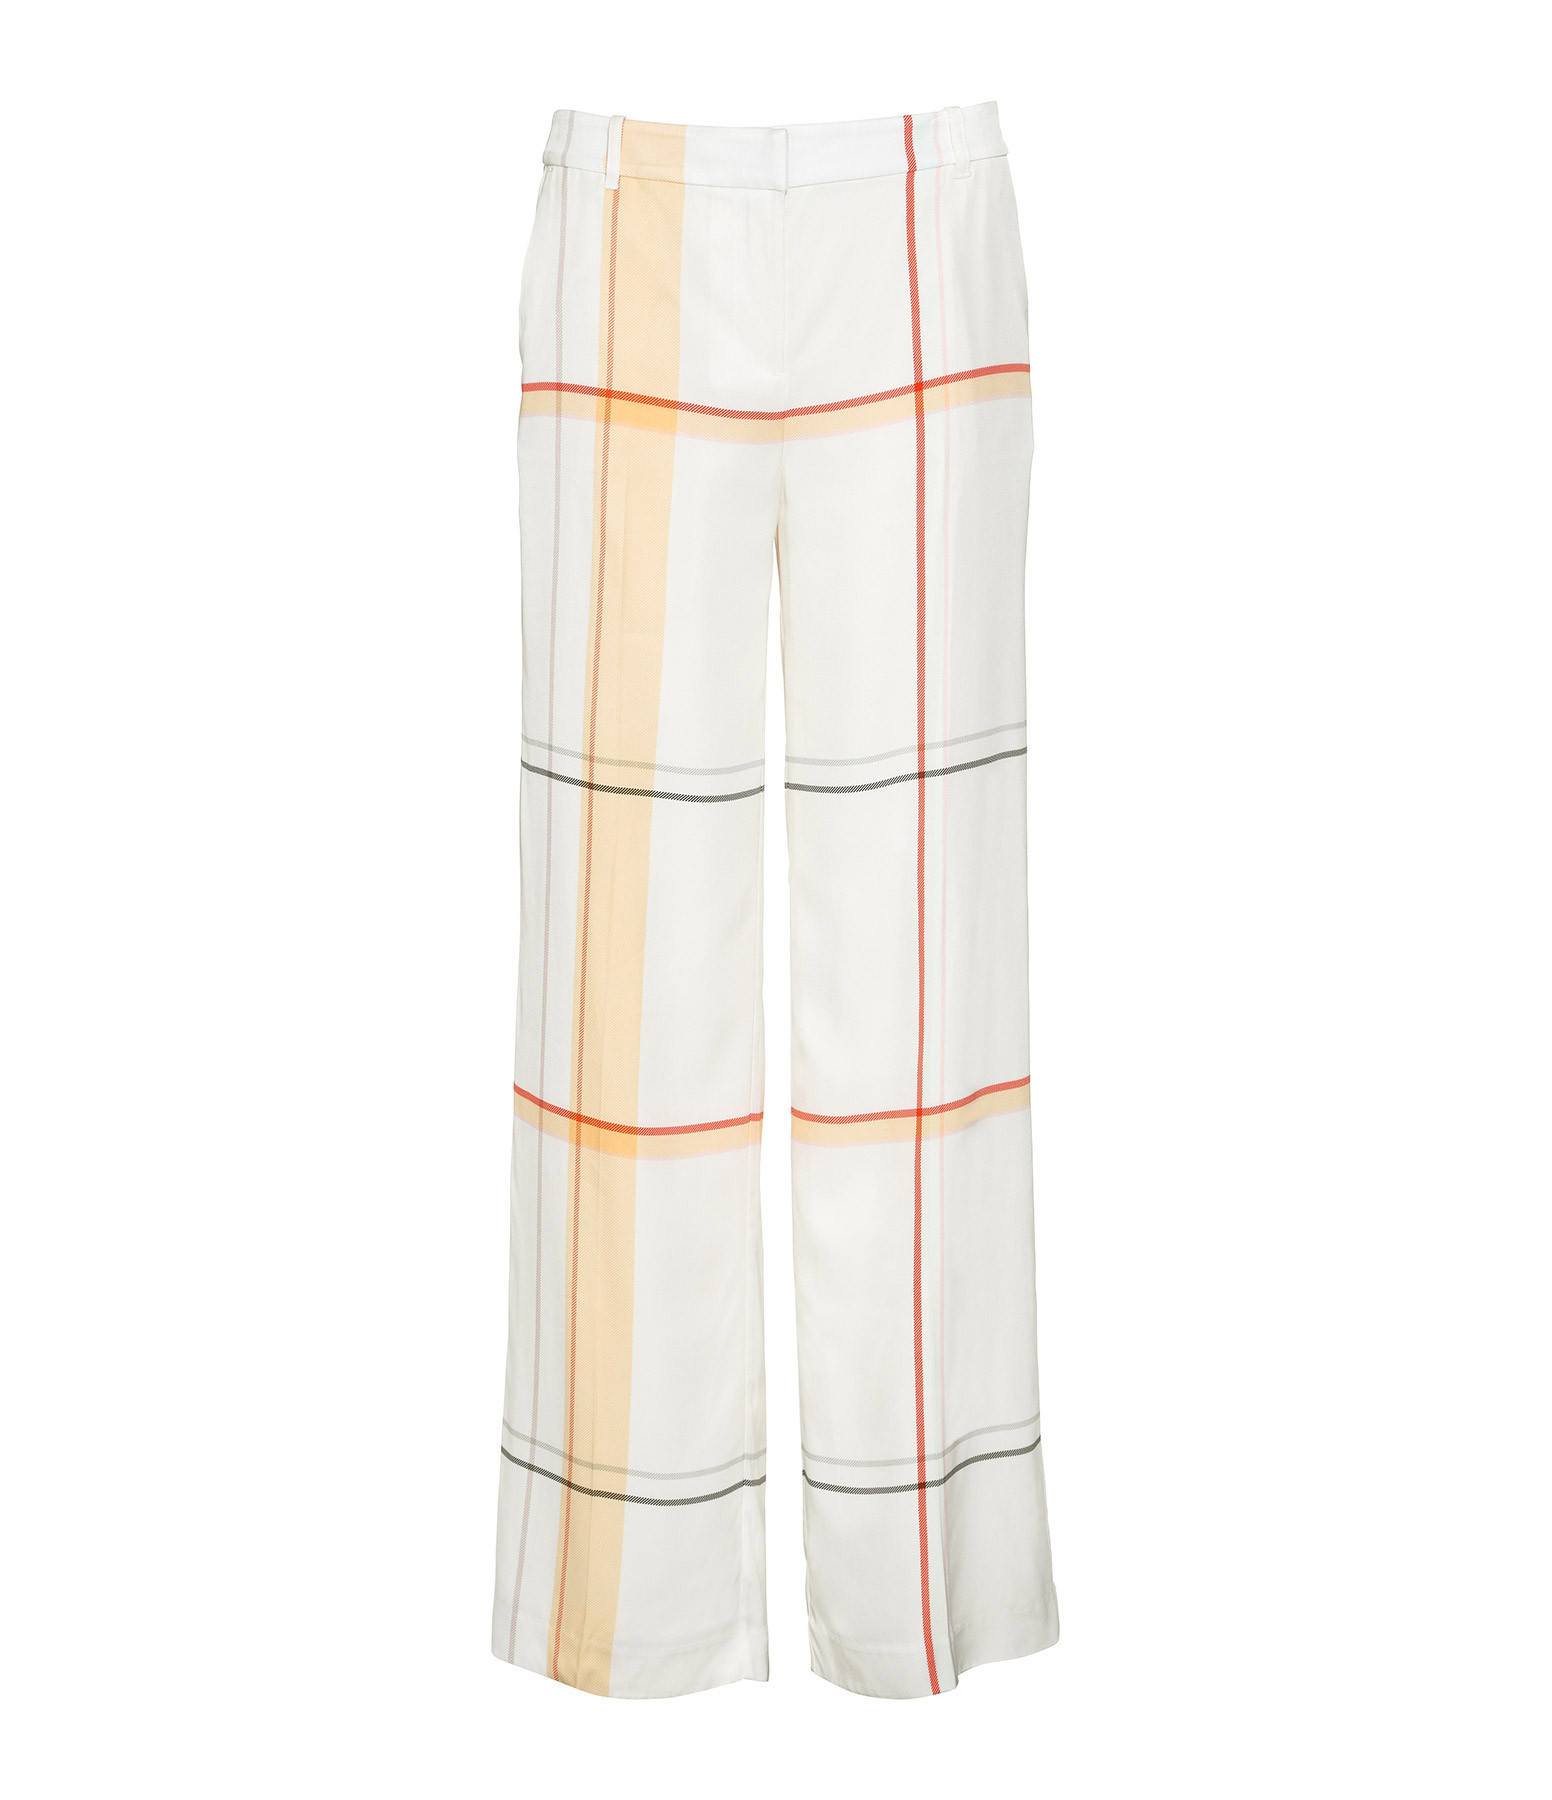 EQUIPMENT - Pantalon Rayures Arwen Blanc